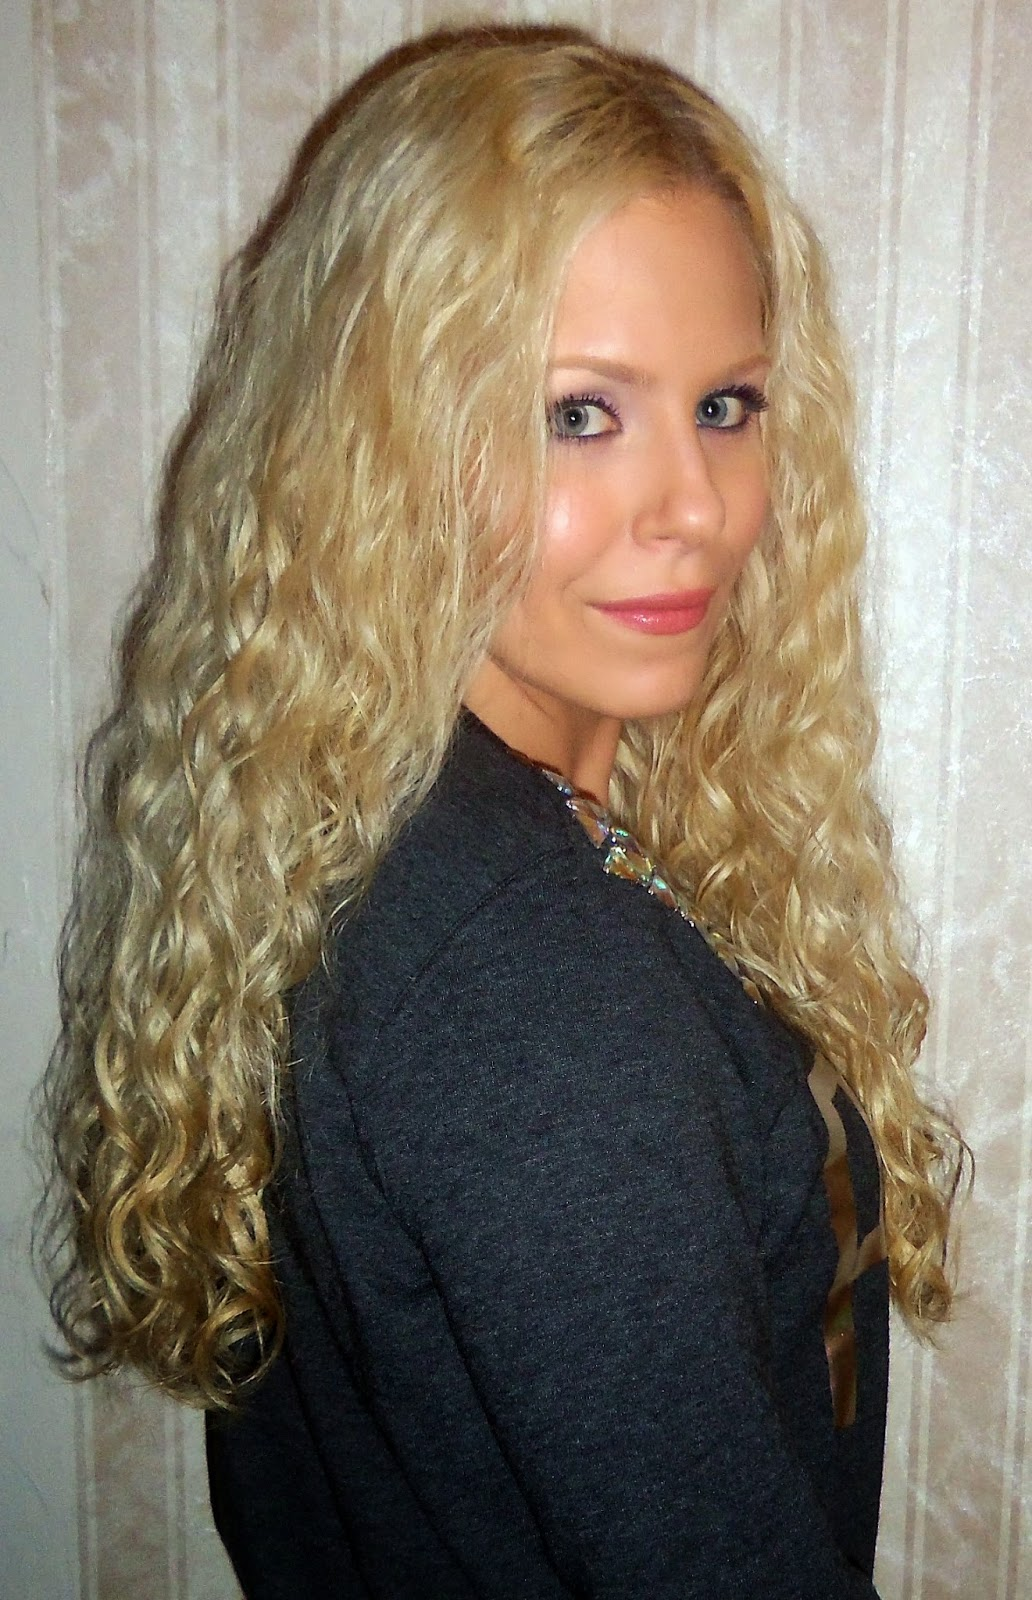 Platinum Blonde Hair With Brown Underneath Brassiness in blonde hair